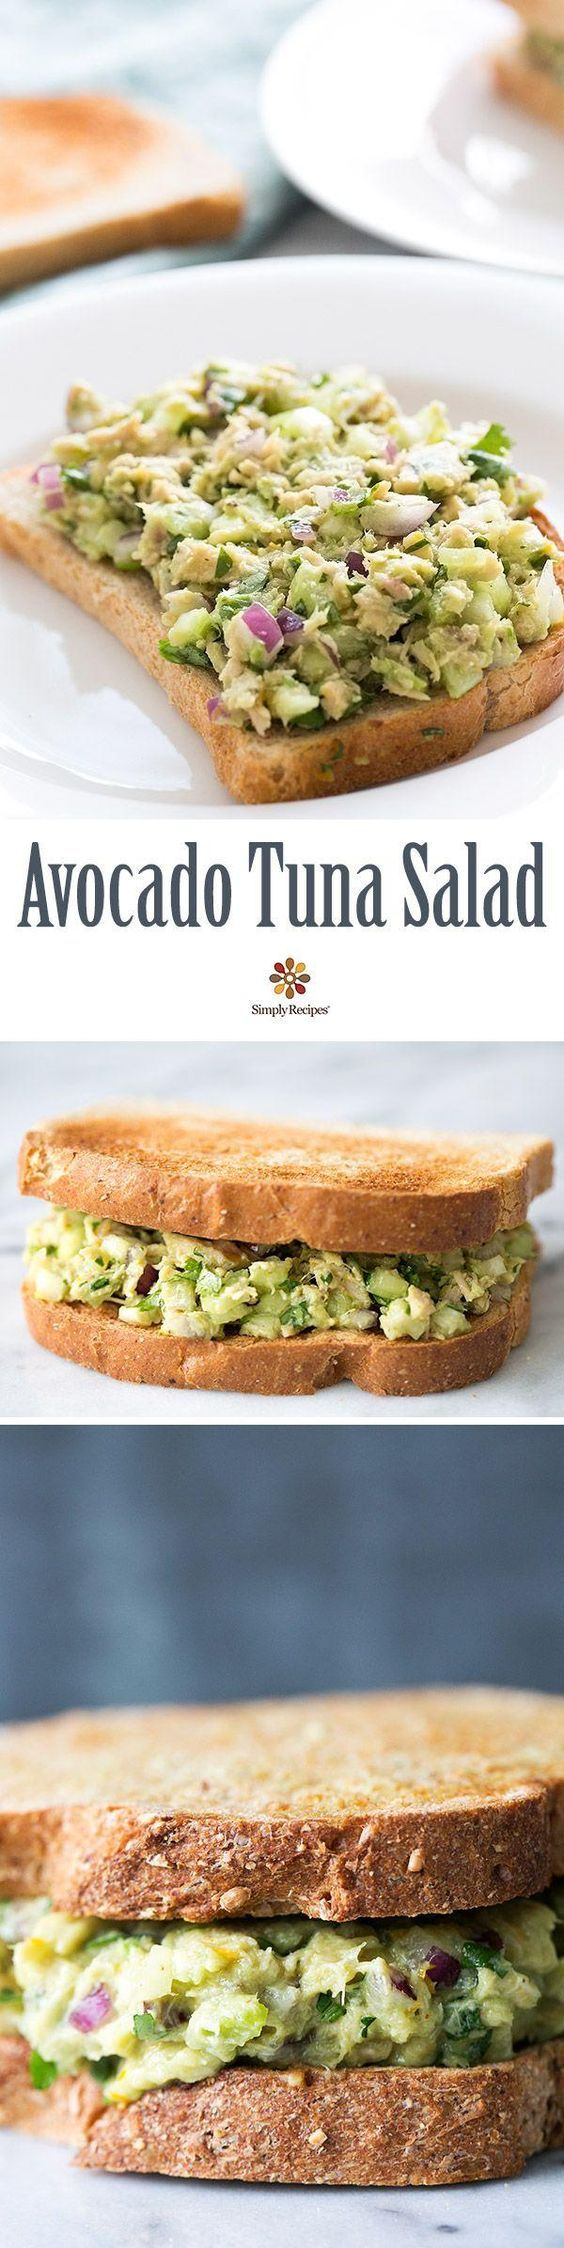 Best 25 avocado tuna salad ideas on pinterest avacodo for Best tuna fish sandwich